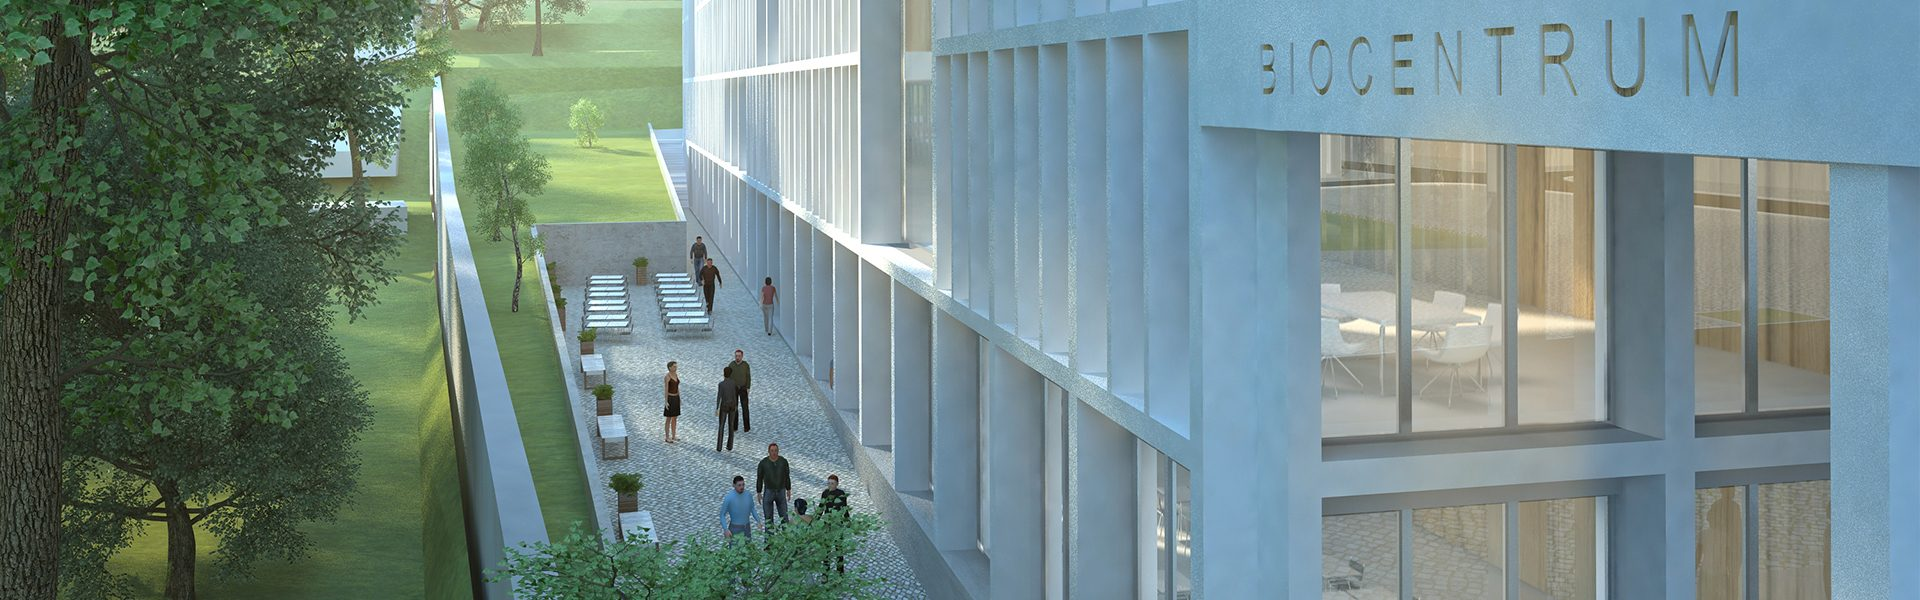 Biocentrum a Globcentrum kampusu Albertov Univerzity Karlovy